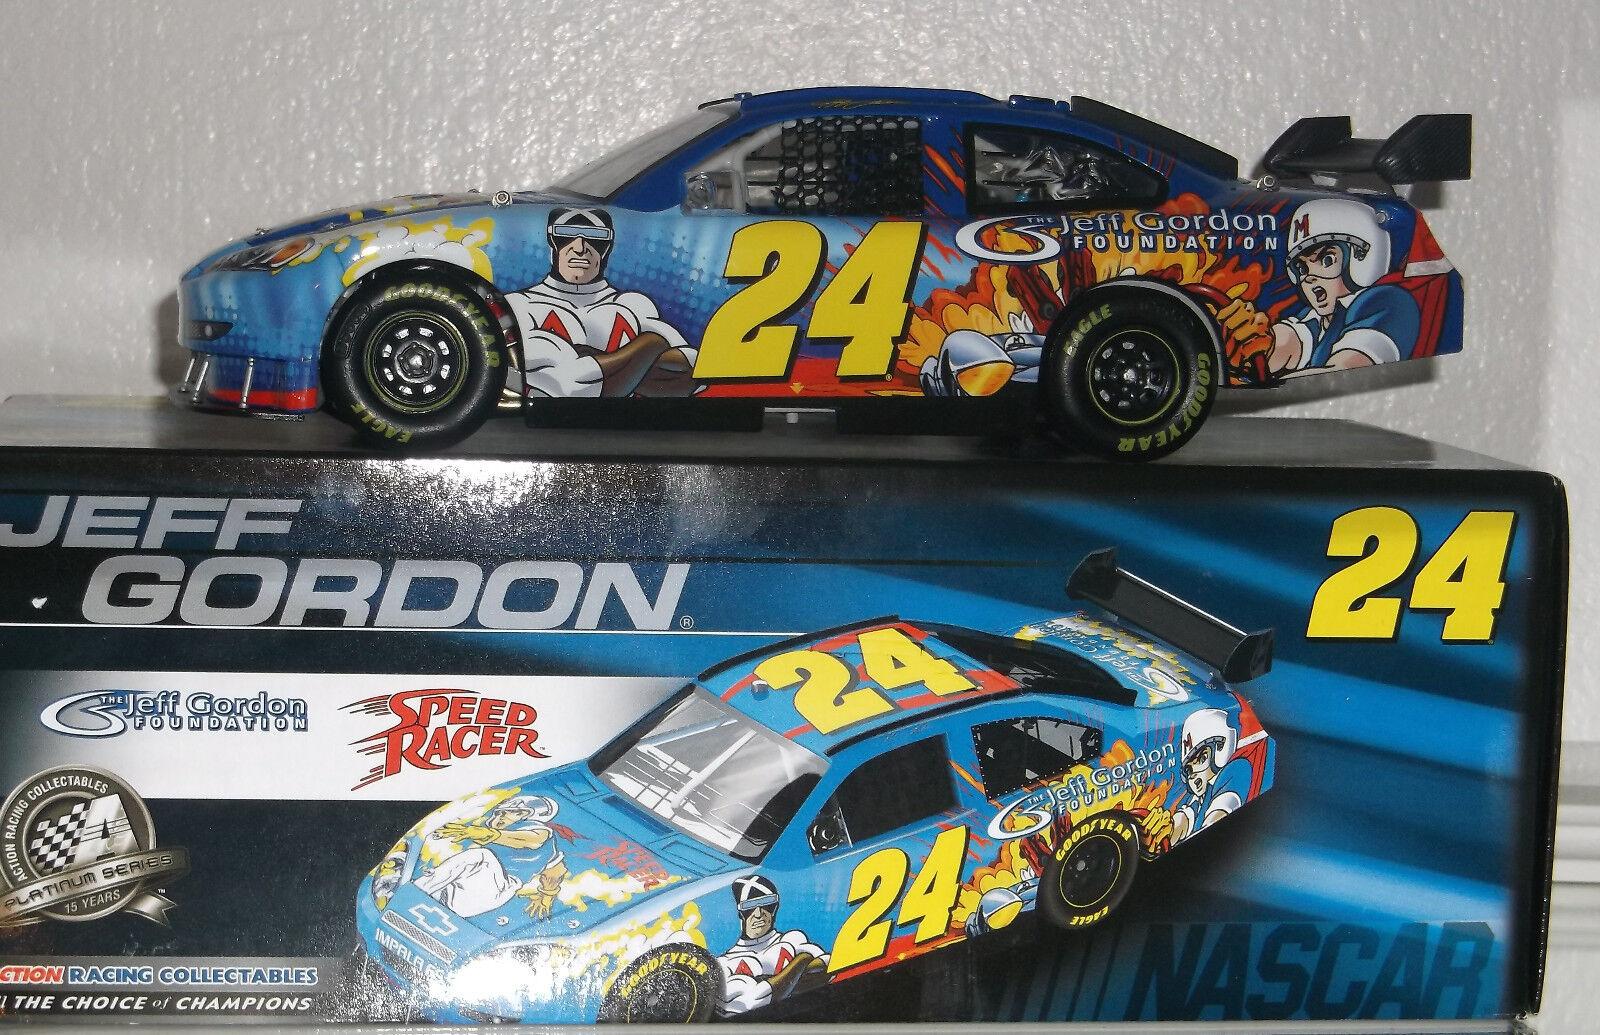 2008 Jeff Gordon Jeff Gordon Fundación Speed Racer 1 24 CAR 5040 Buen